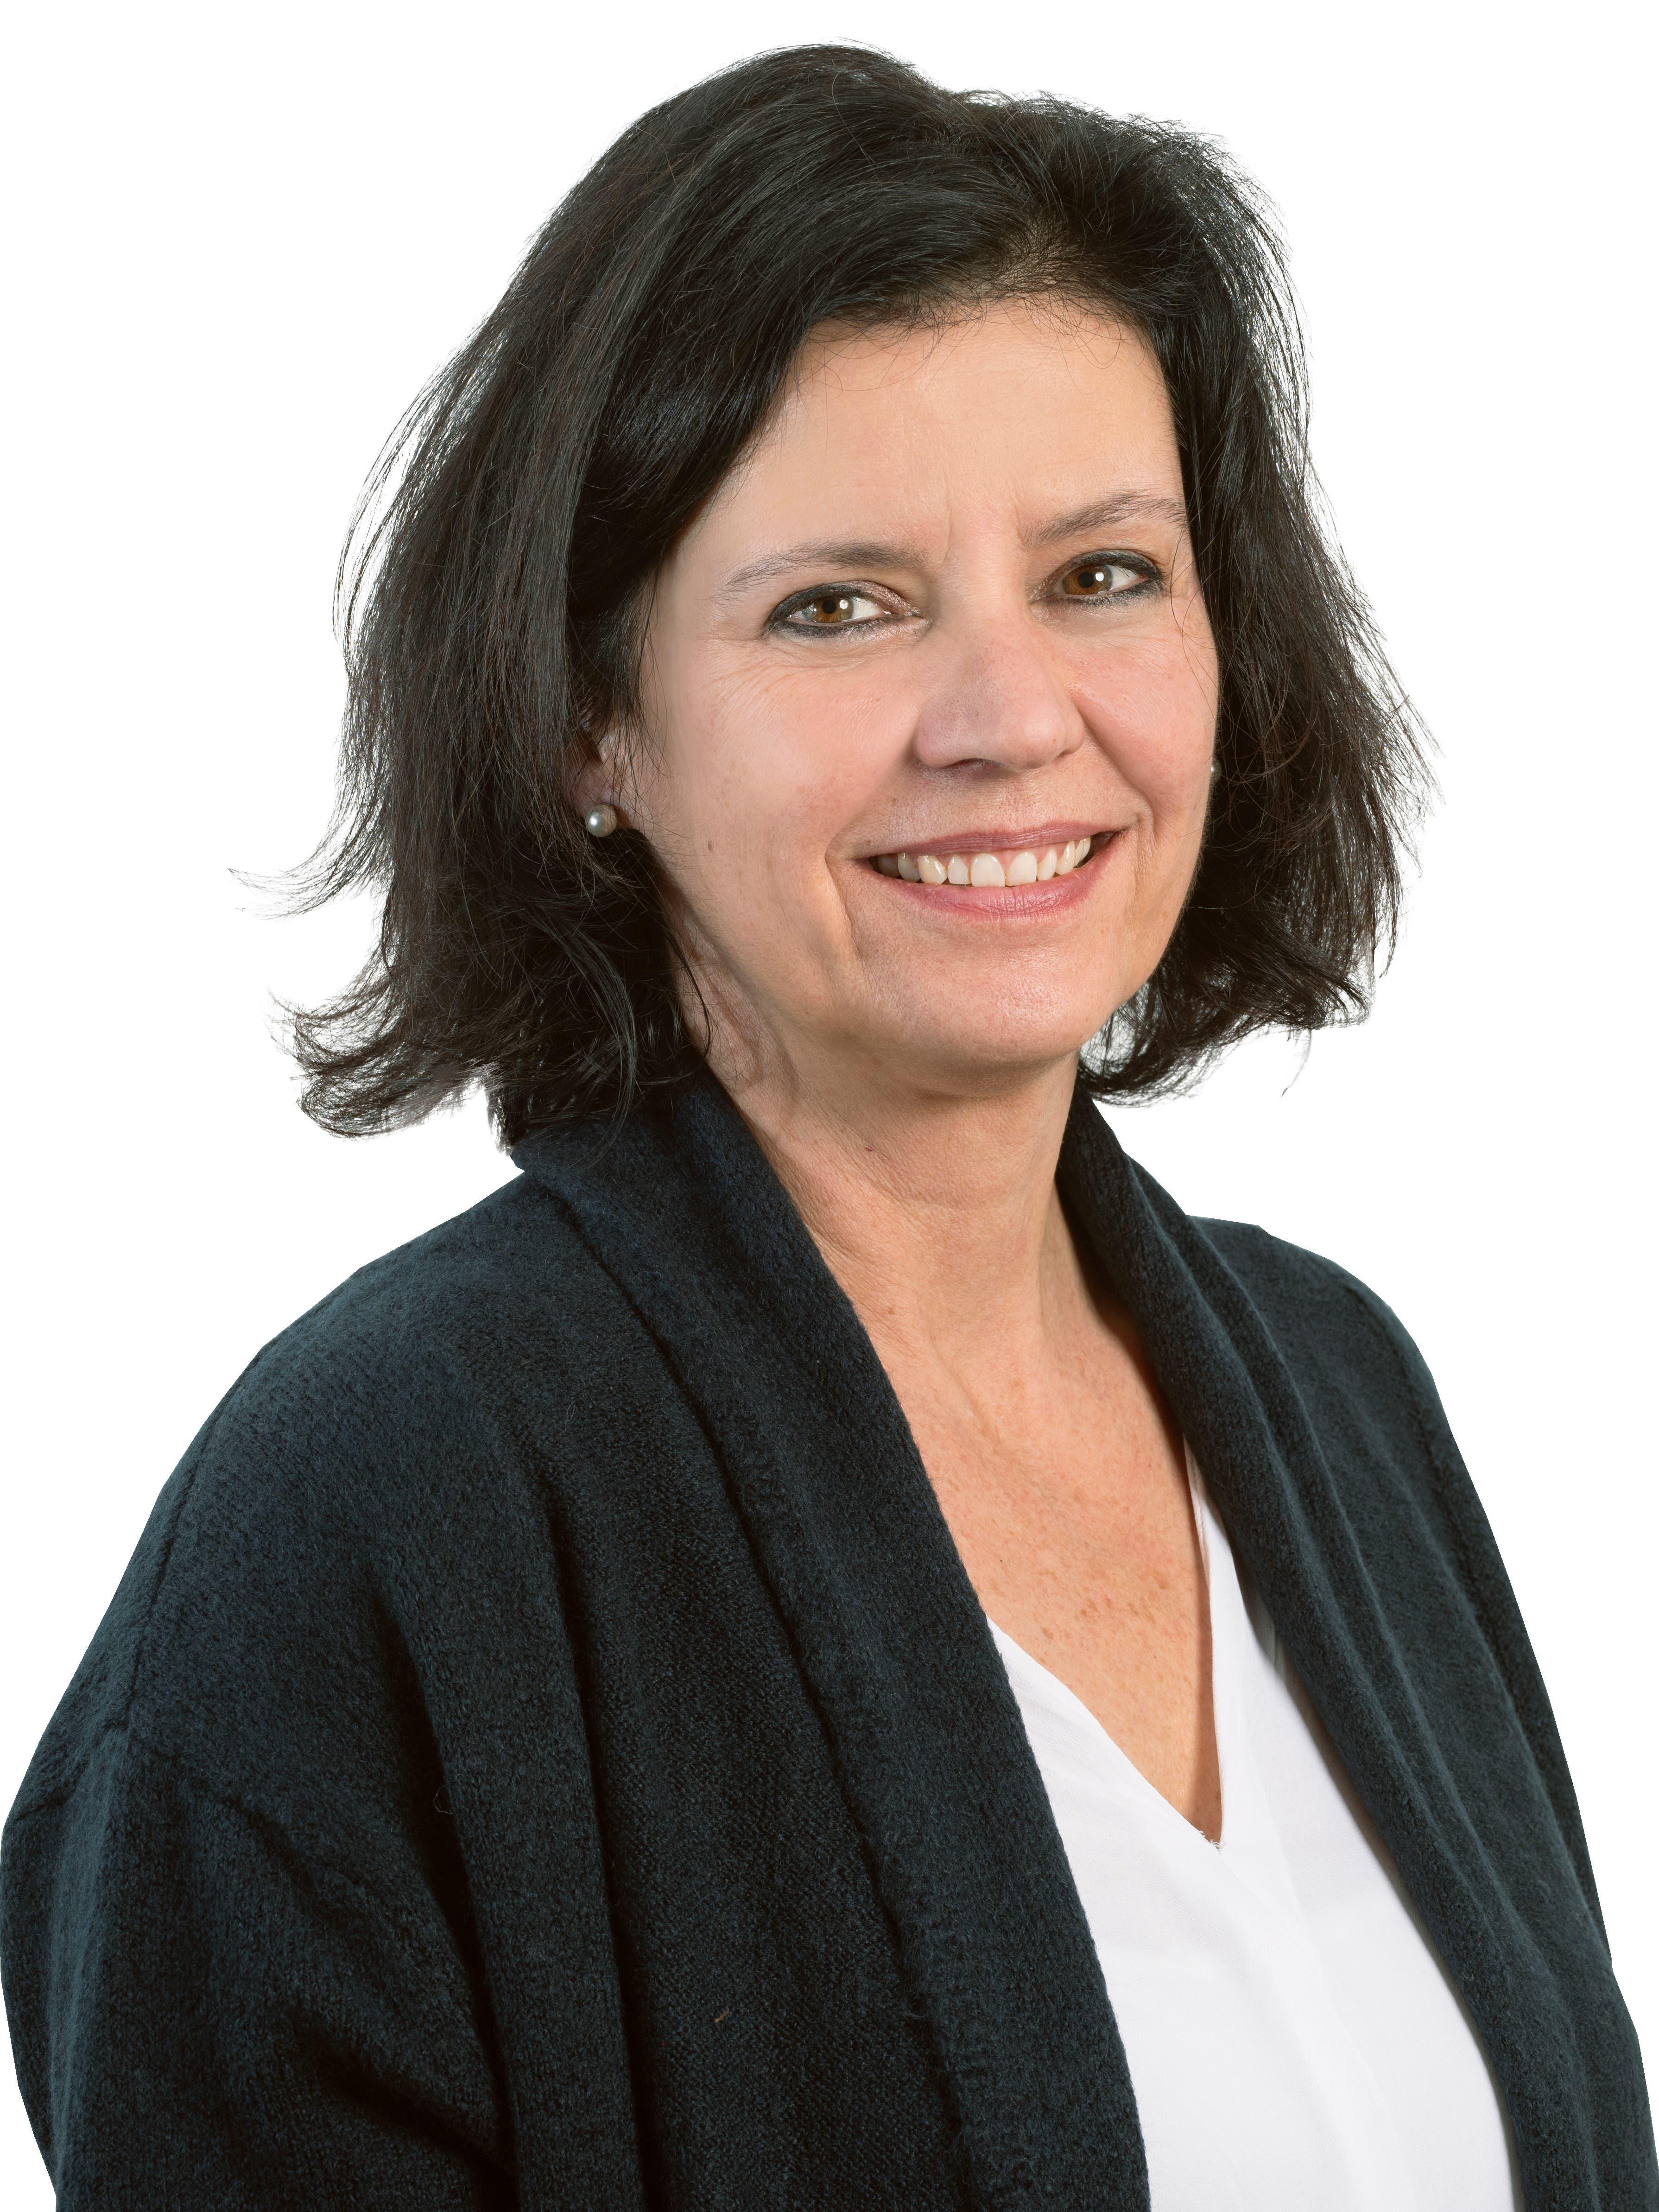 Gewählt: Patrizia Brun, FDP (neu)